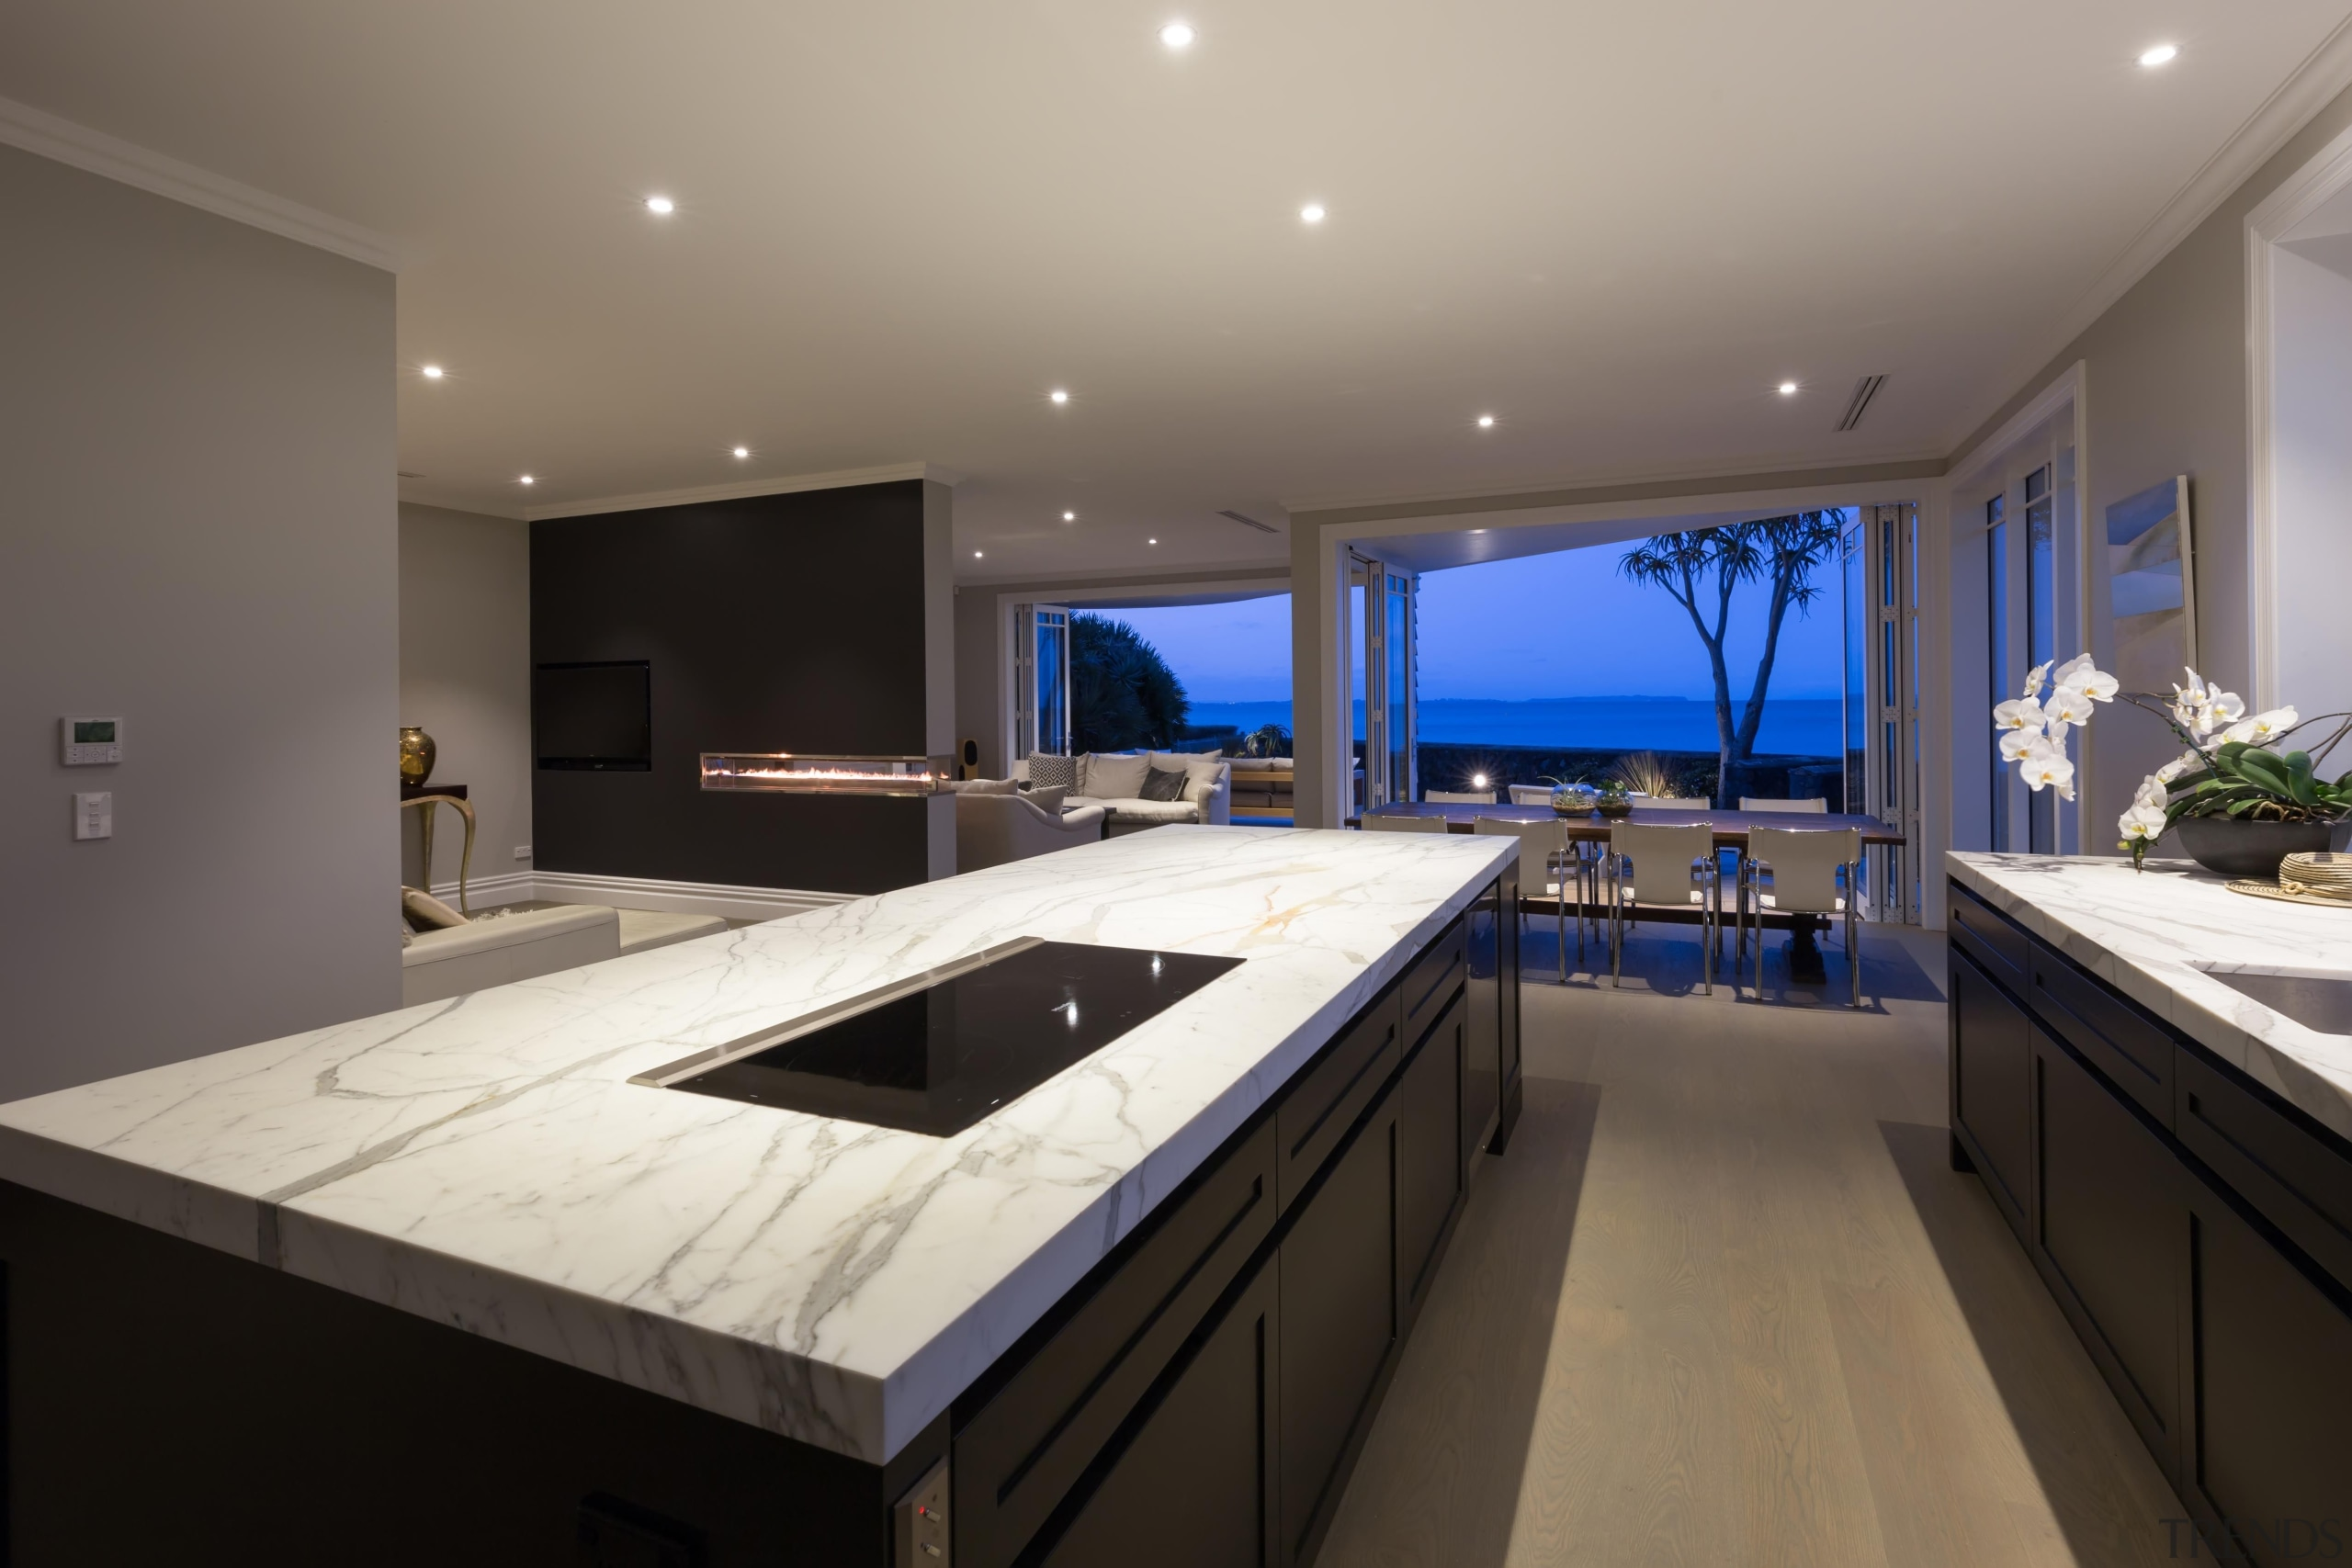 img9004 - countertop   interior design   kitchen countertop, interior design, kitchen, real estate, room, gray, black